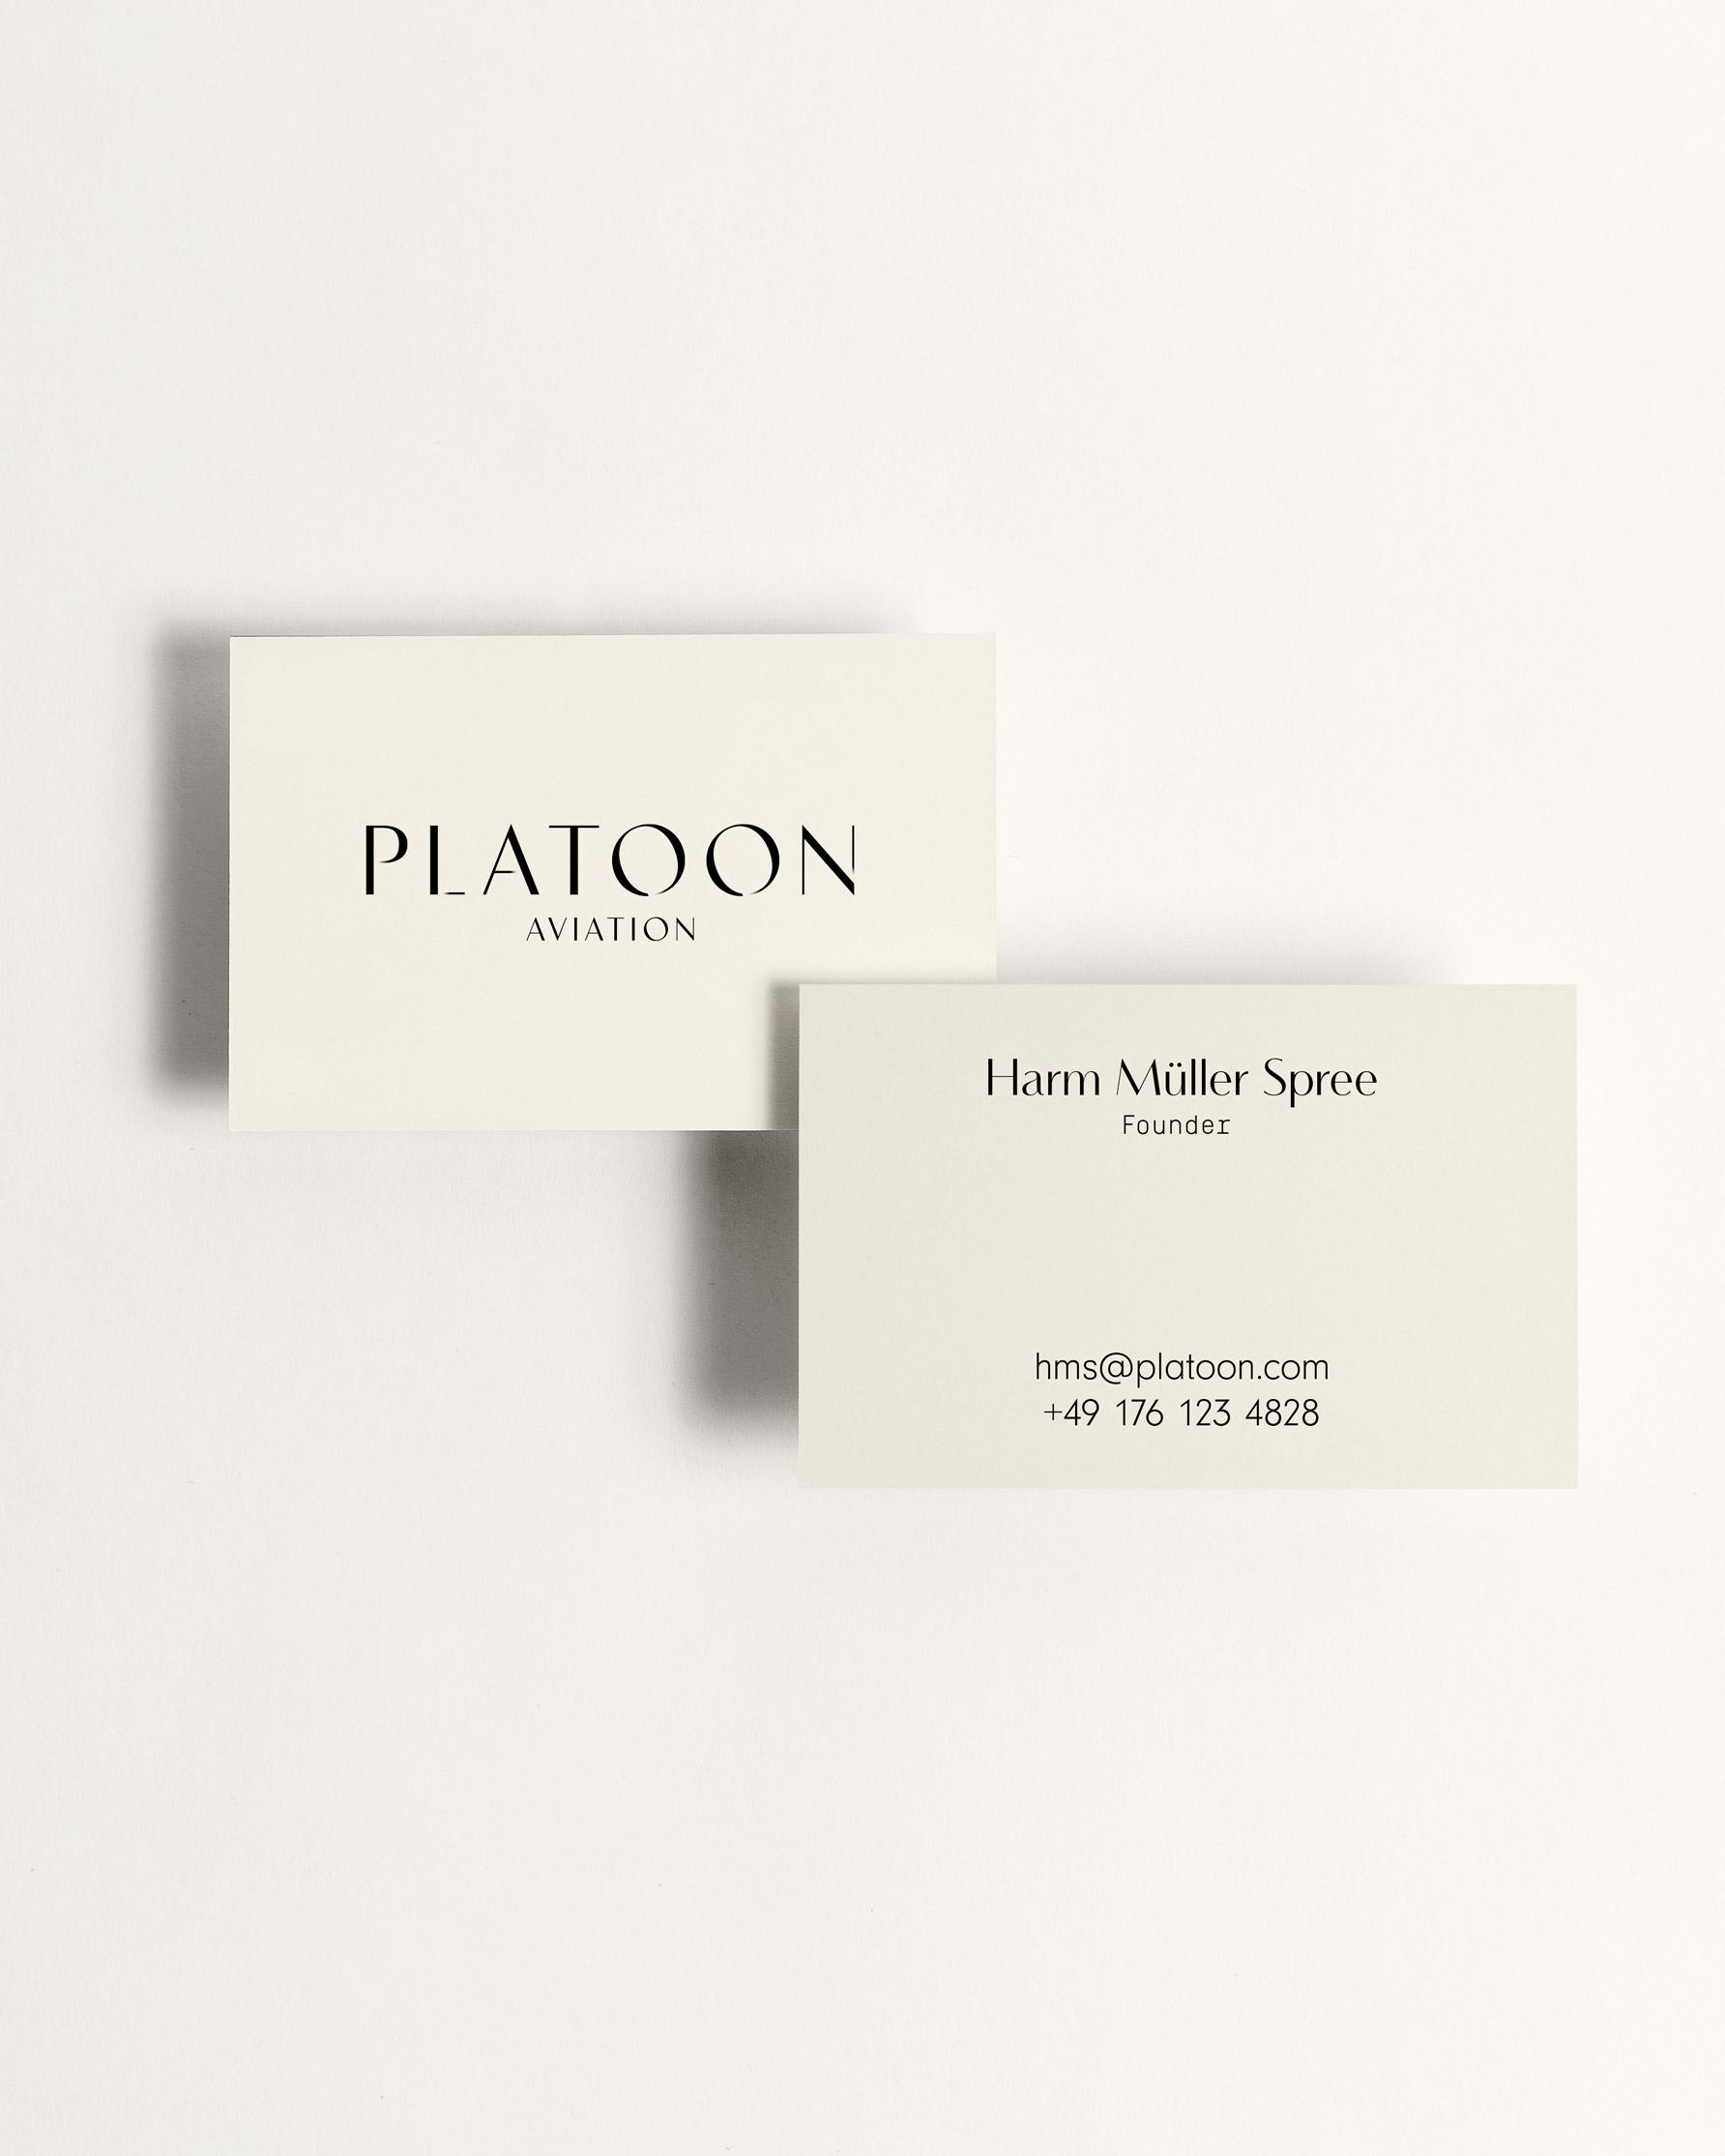 Platoon - Brand Business Cards